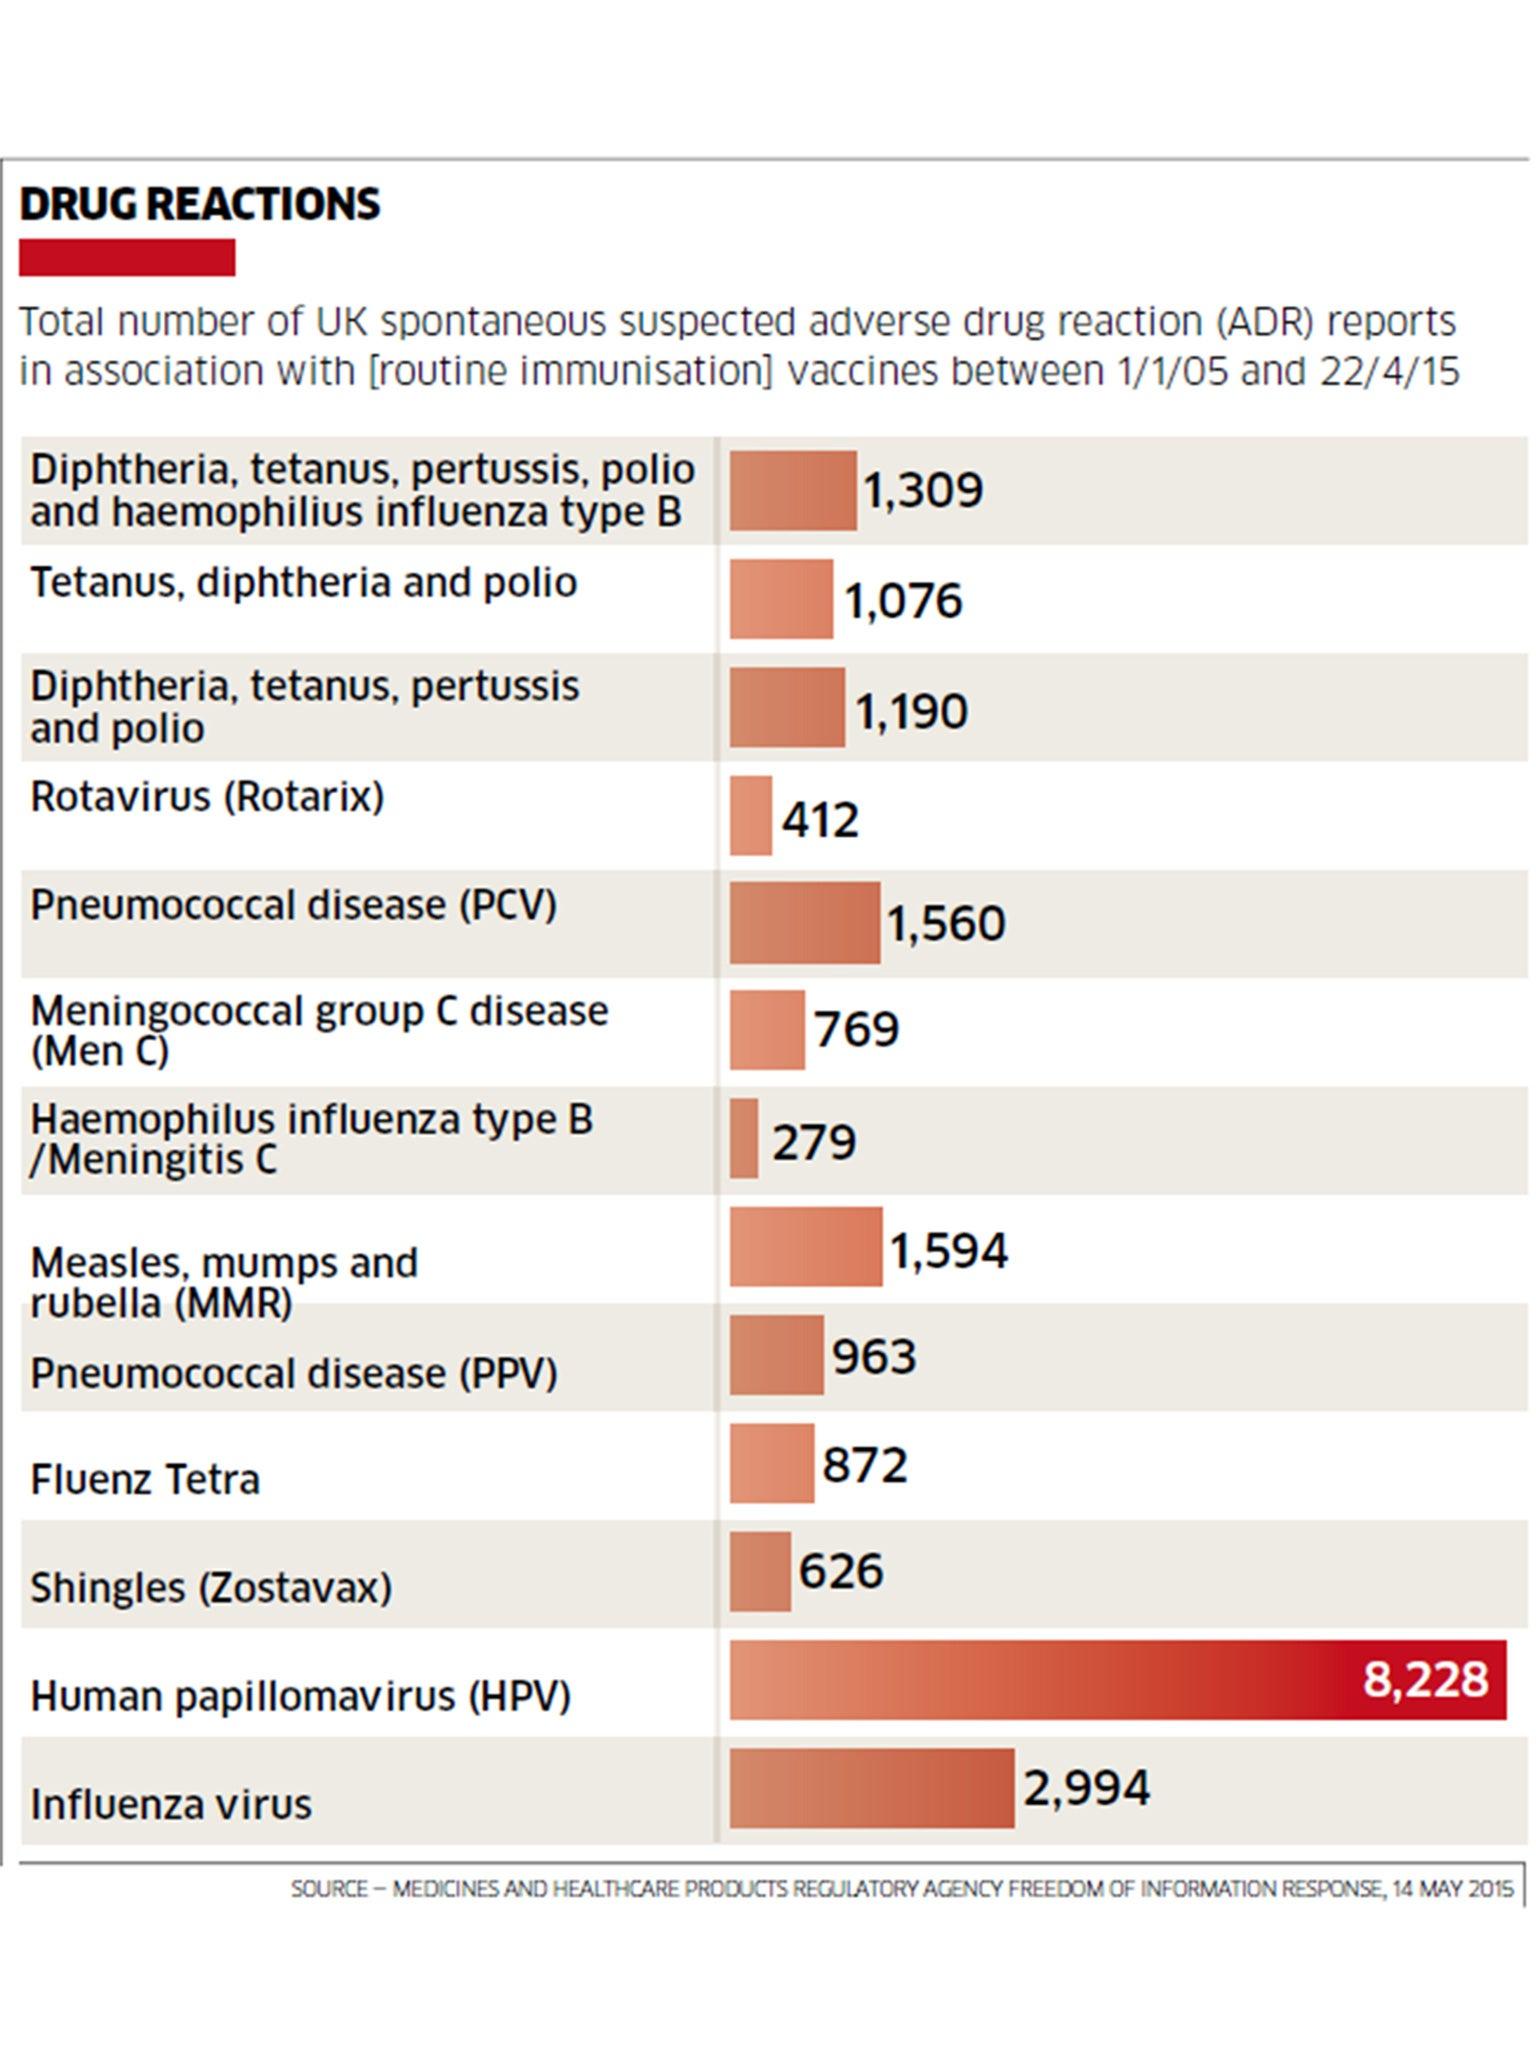 human papillomavirus hpv vaccine side effects